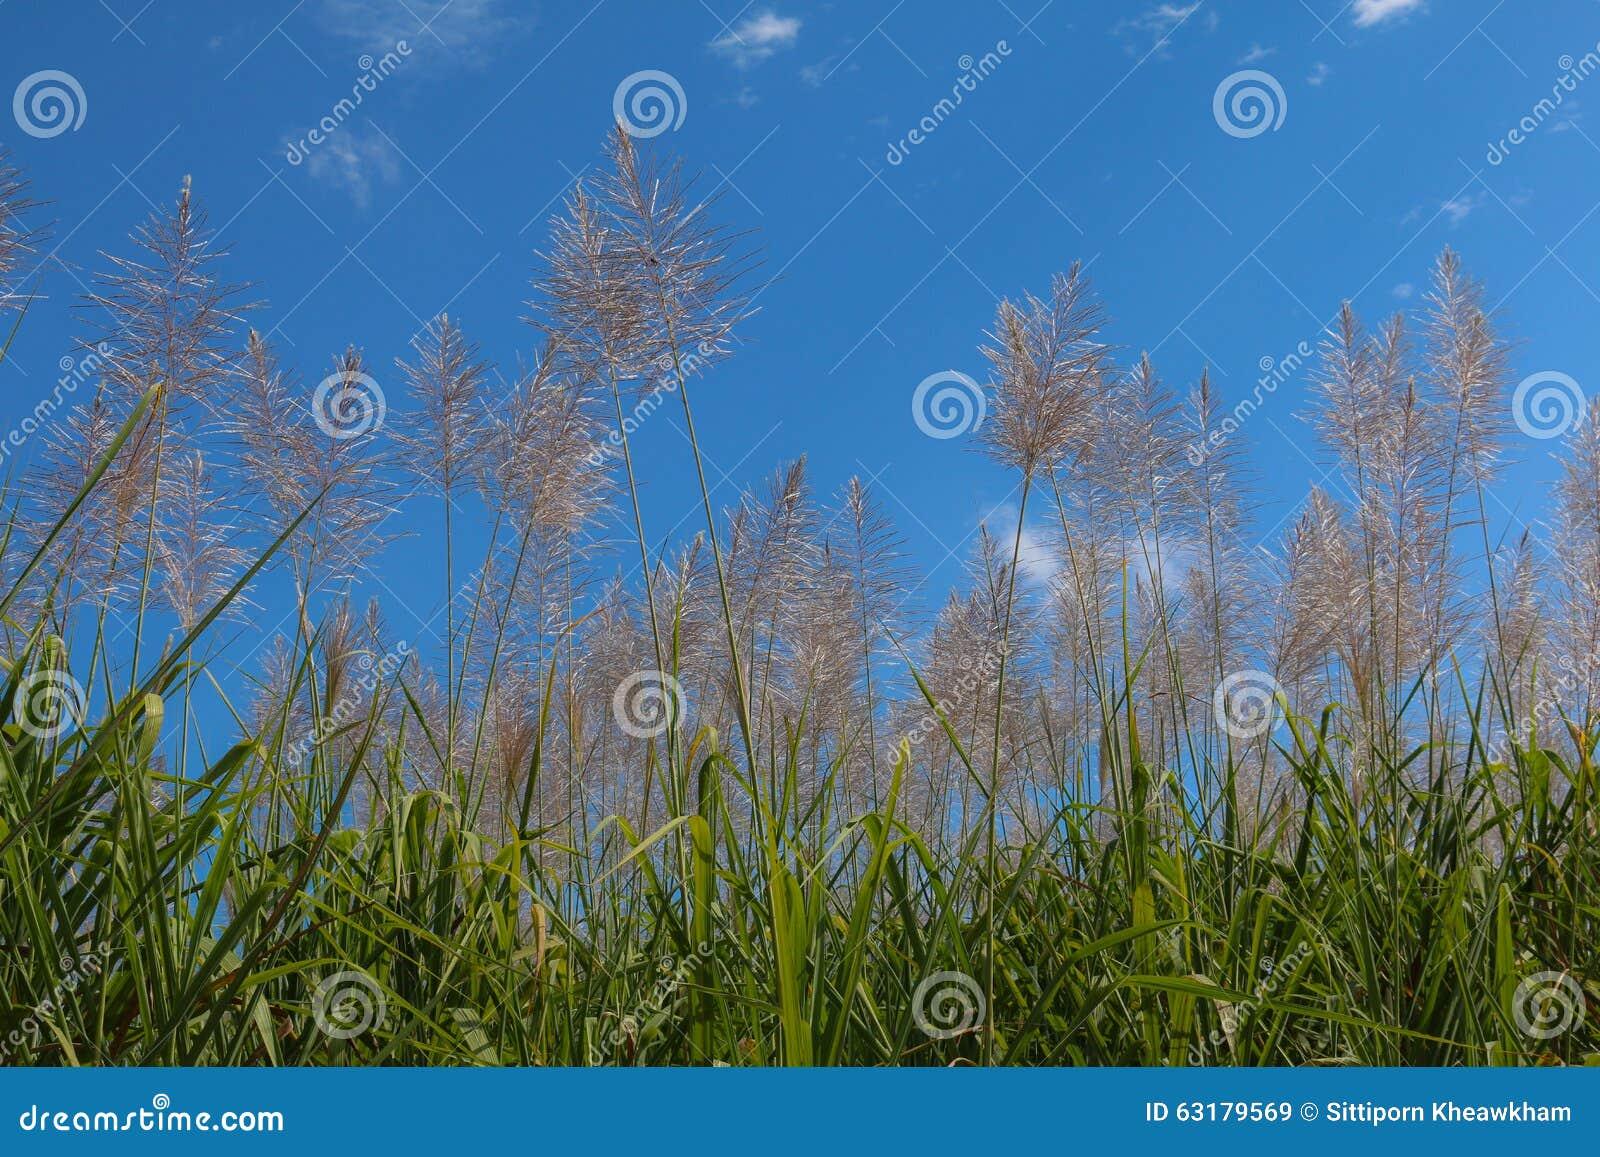 Sugar Cane Flower Sunrise,Beauty Blue Sky Stock Photo ...